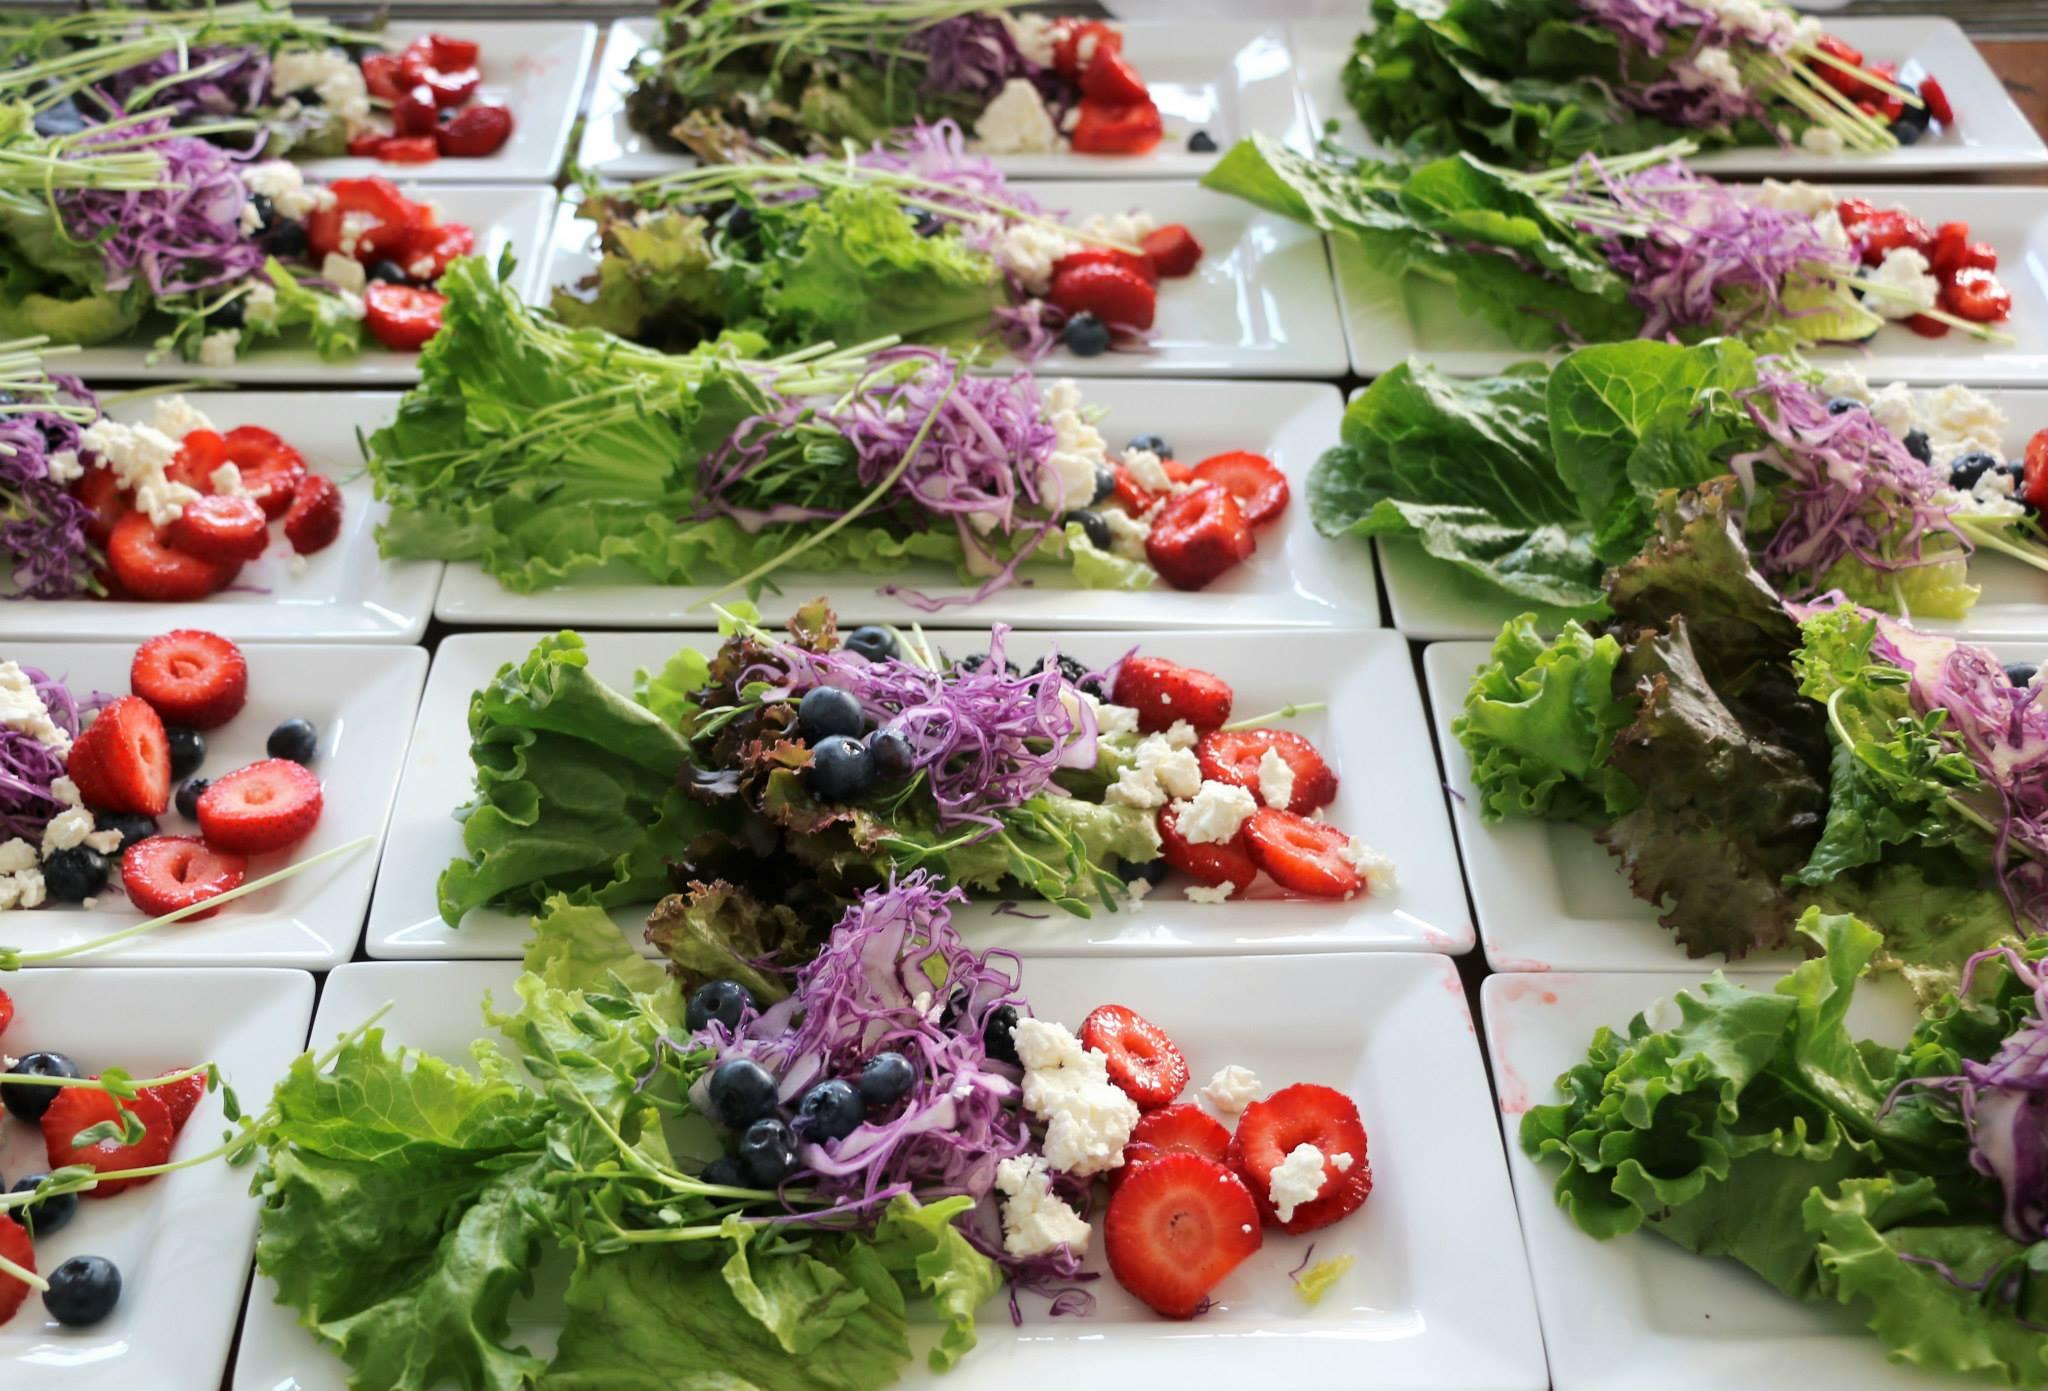 Salad group.jpg